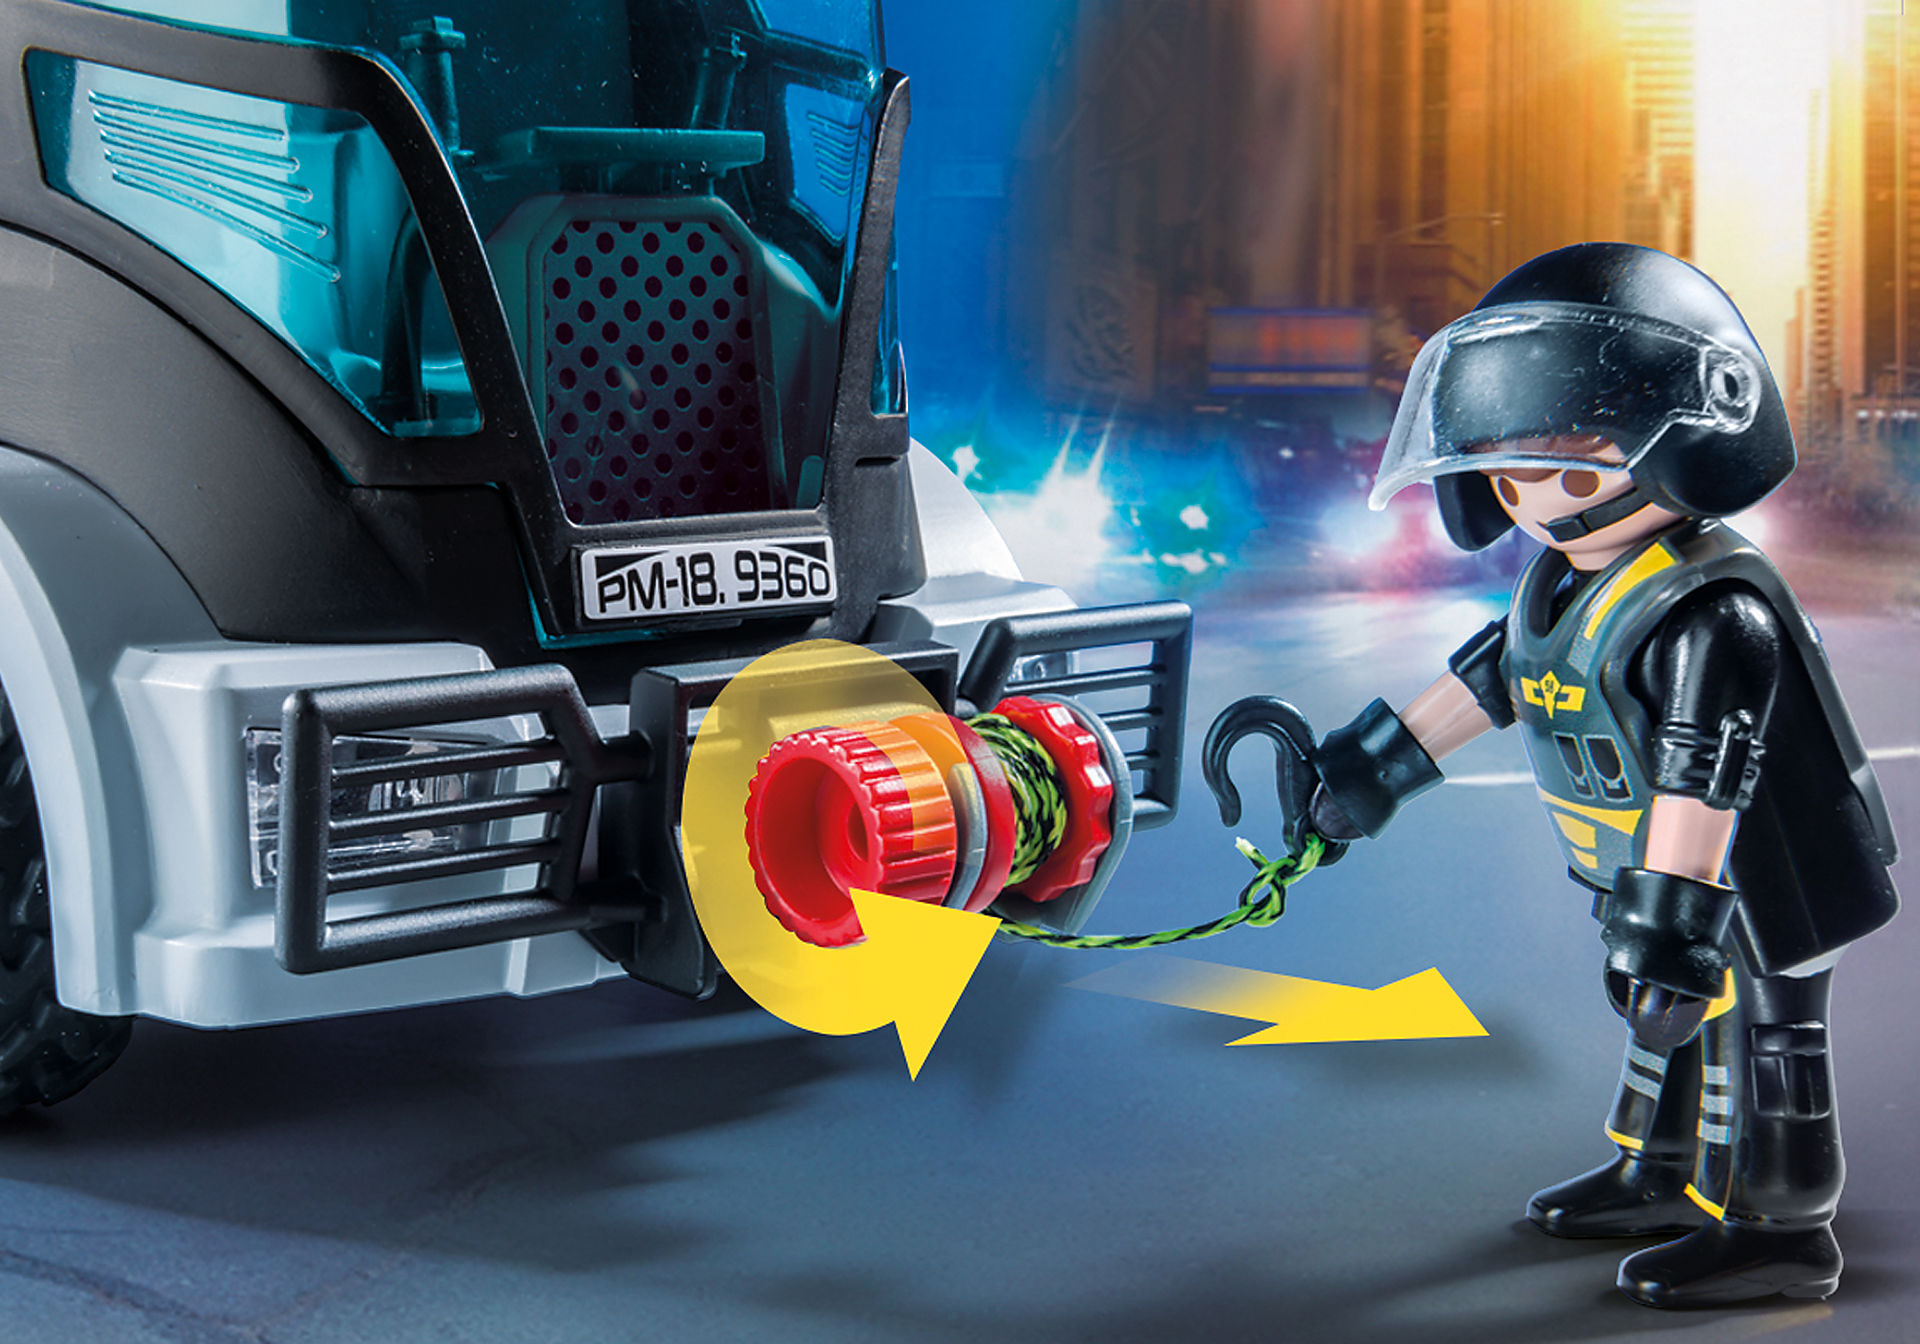 http://media.playmobil.com/i/playmobil/9360_product_extra2/Camion des policiers d'élite avec sirène et gyrophare